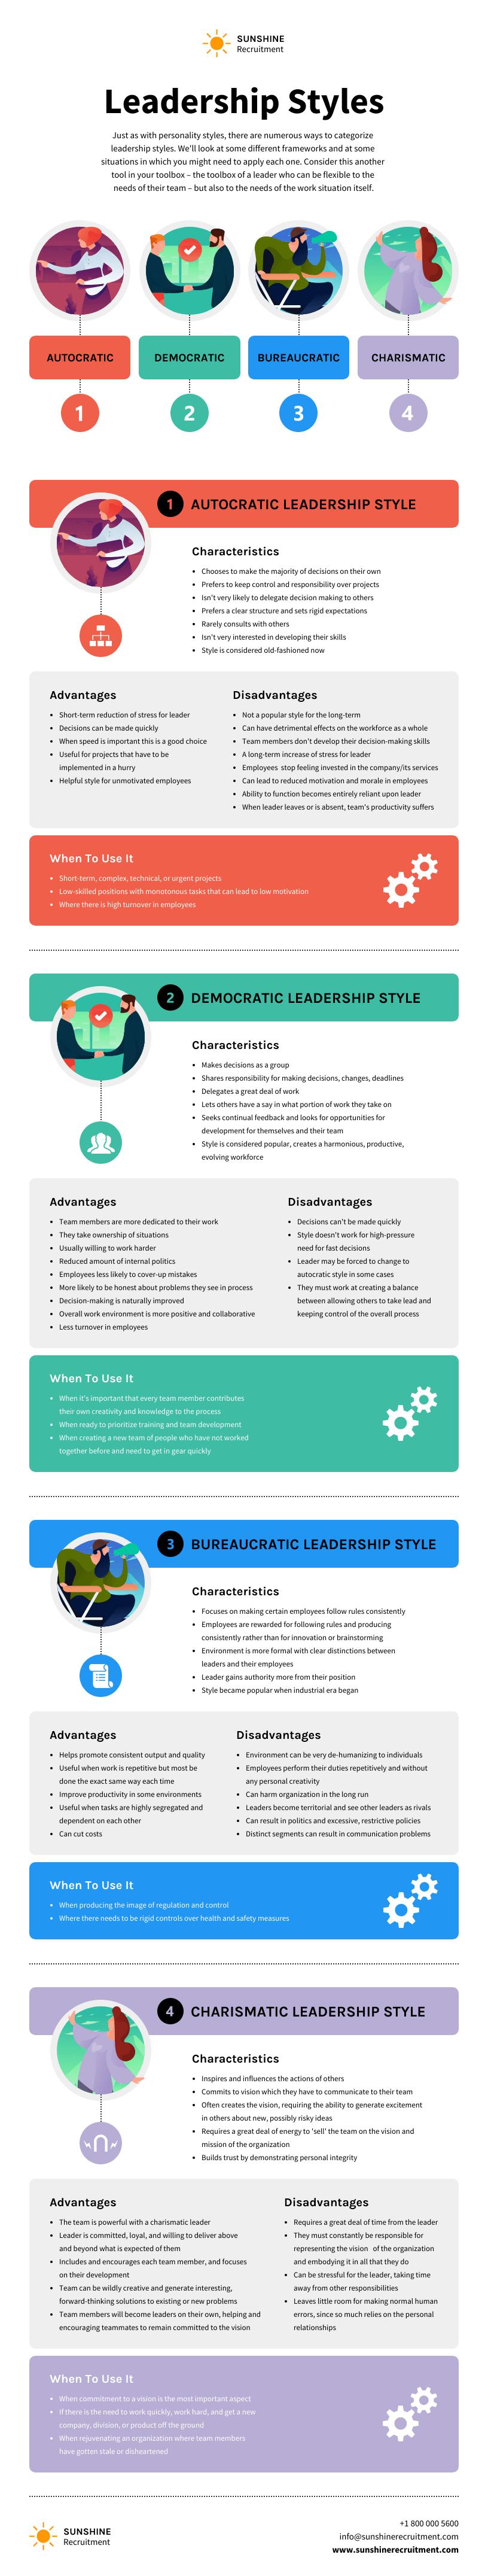 Training material leadership styles information